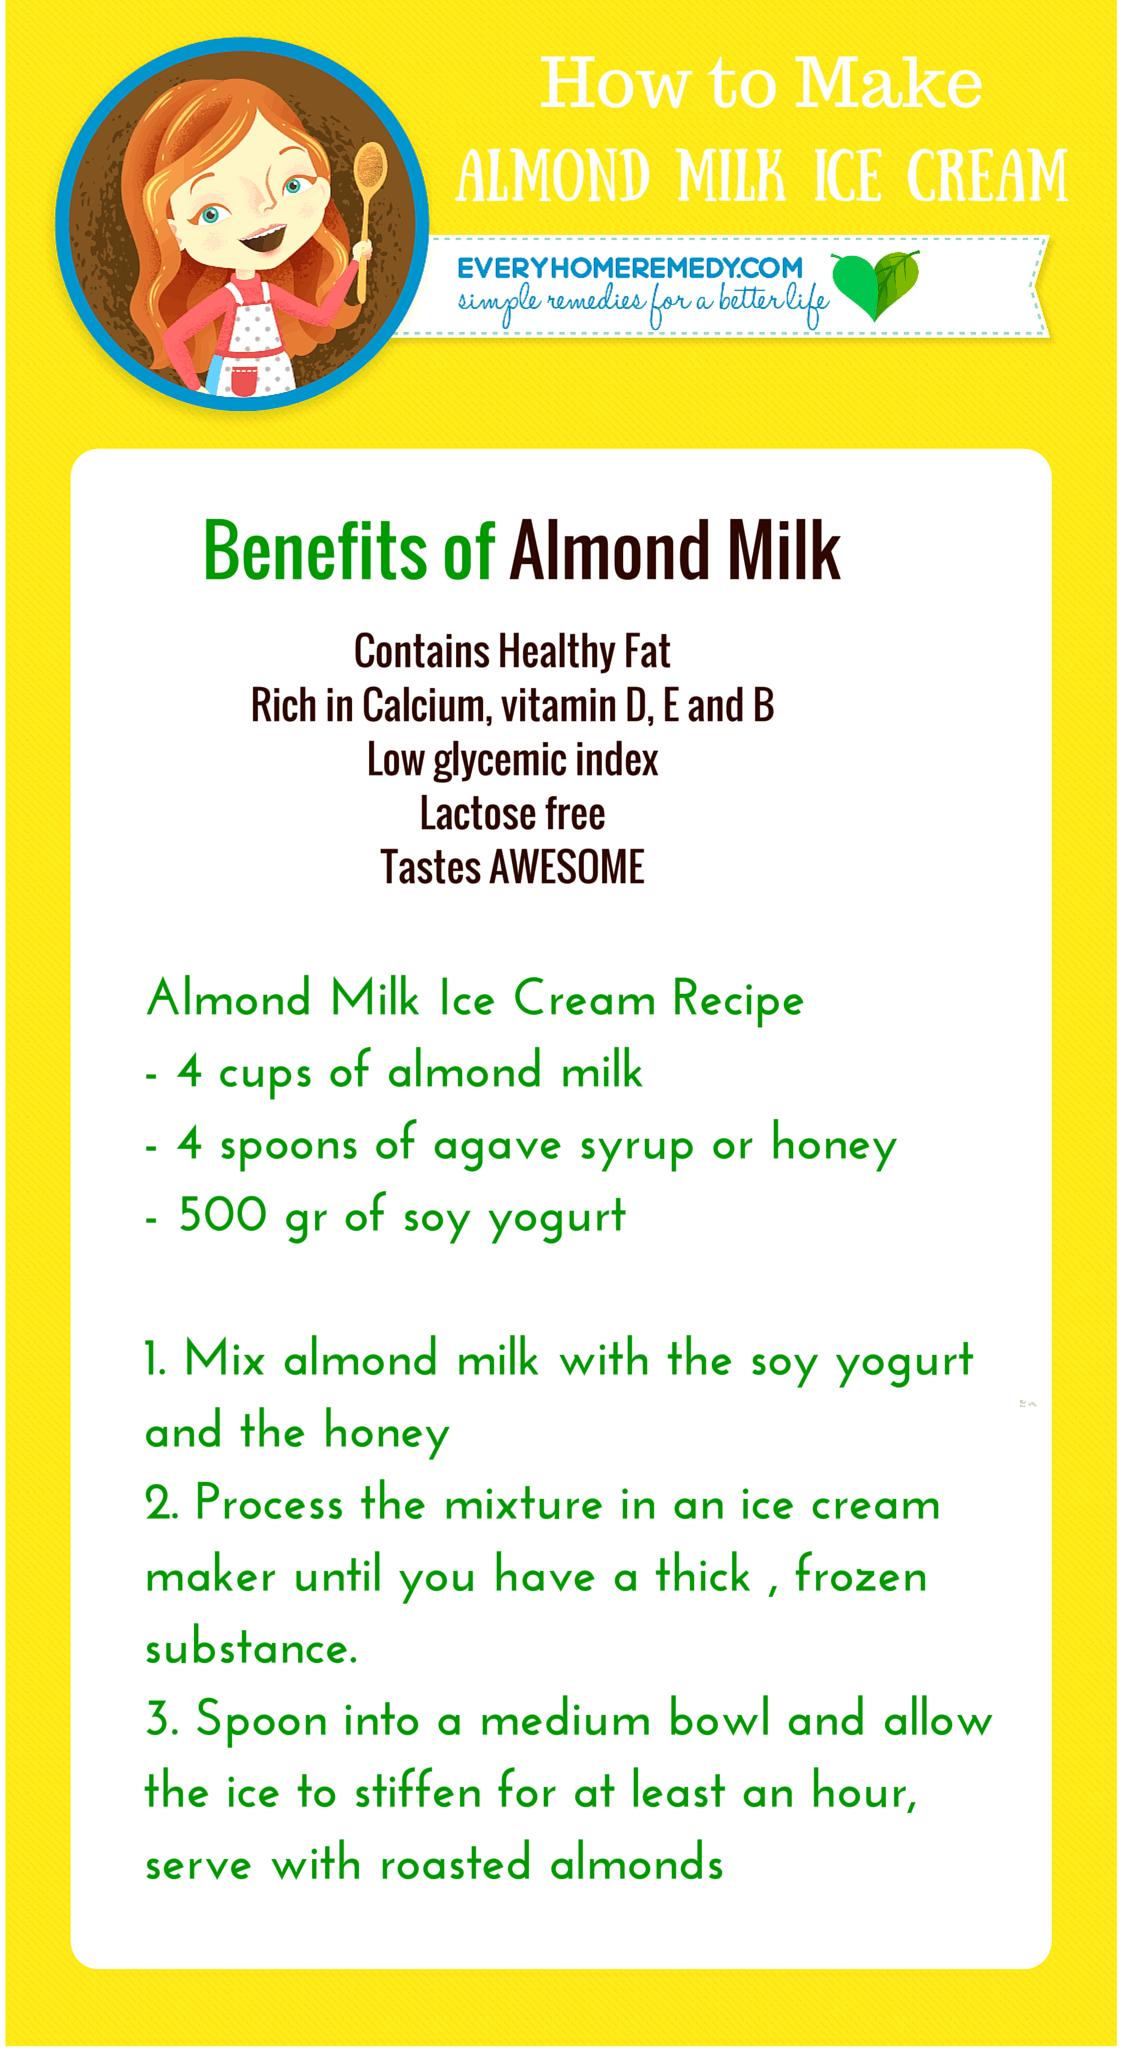 How to make almond milk ice cream